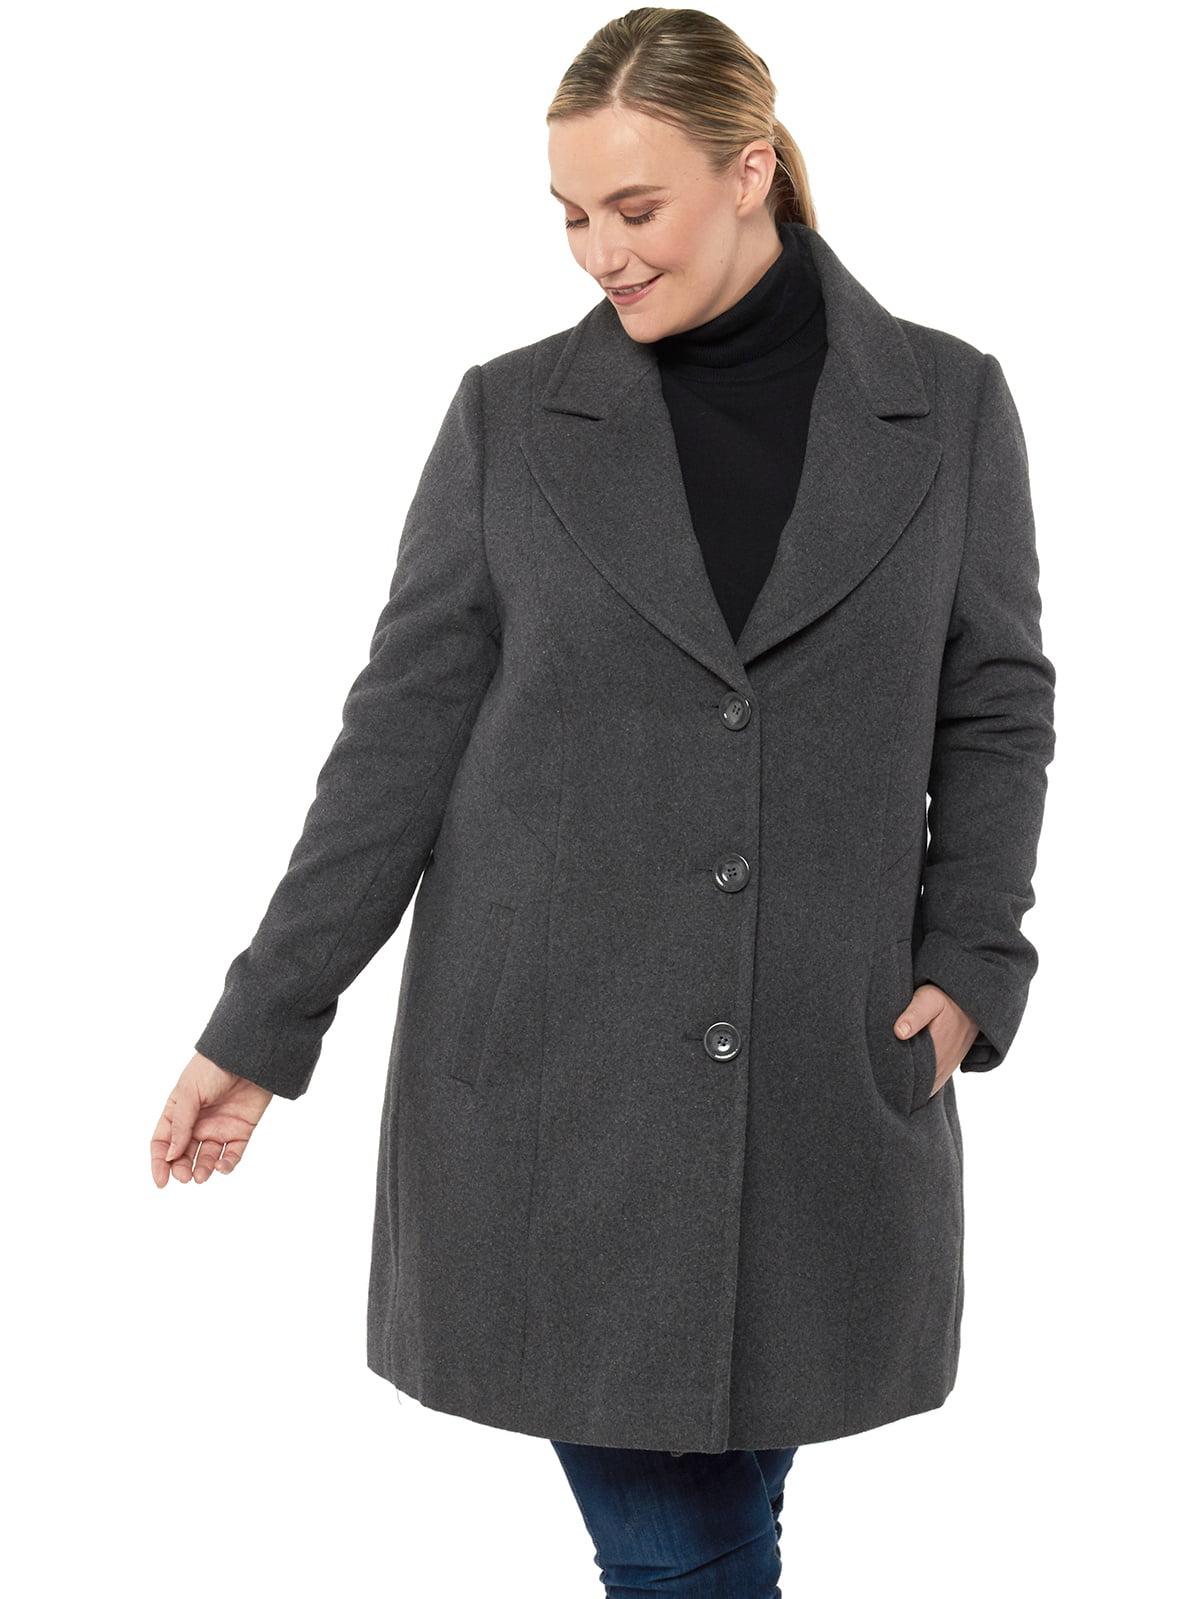 S-Fly Womens Buttons Woolen Blend Overcoat Classic Notch Lapel Walking Coat